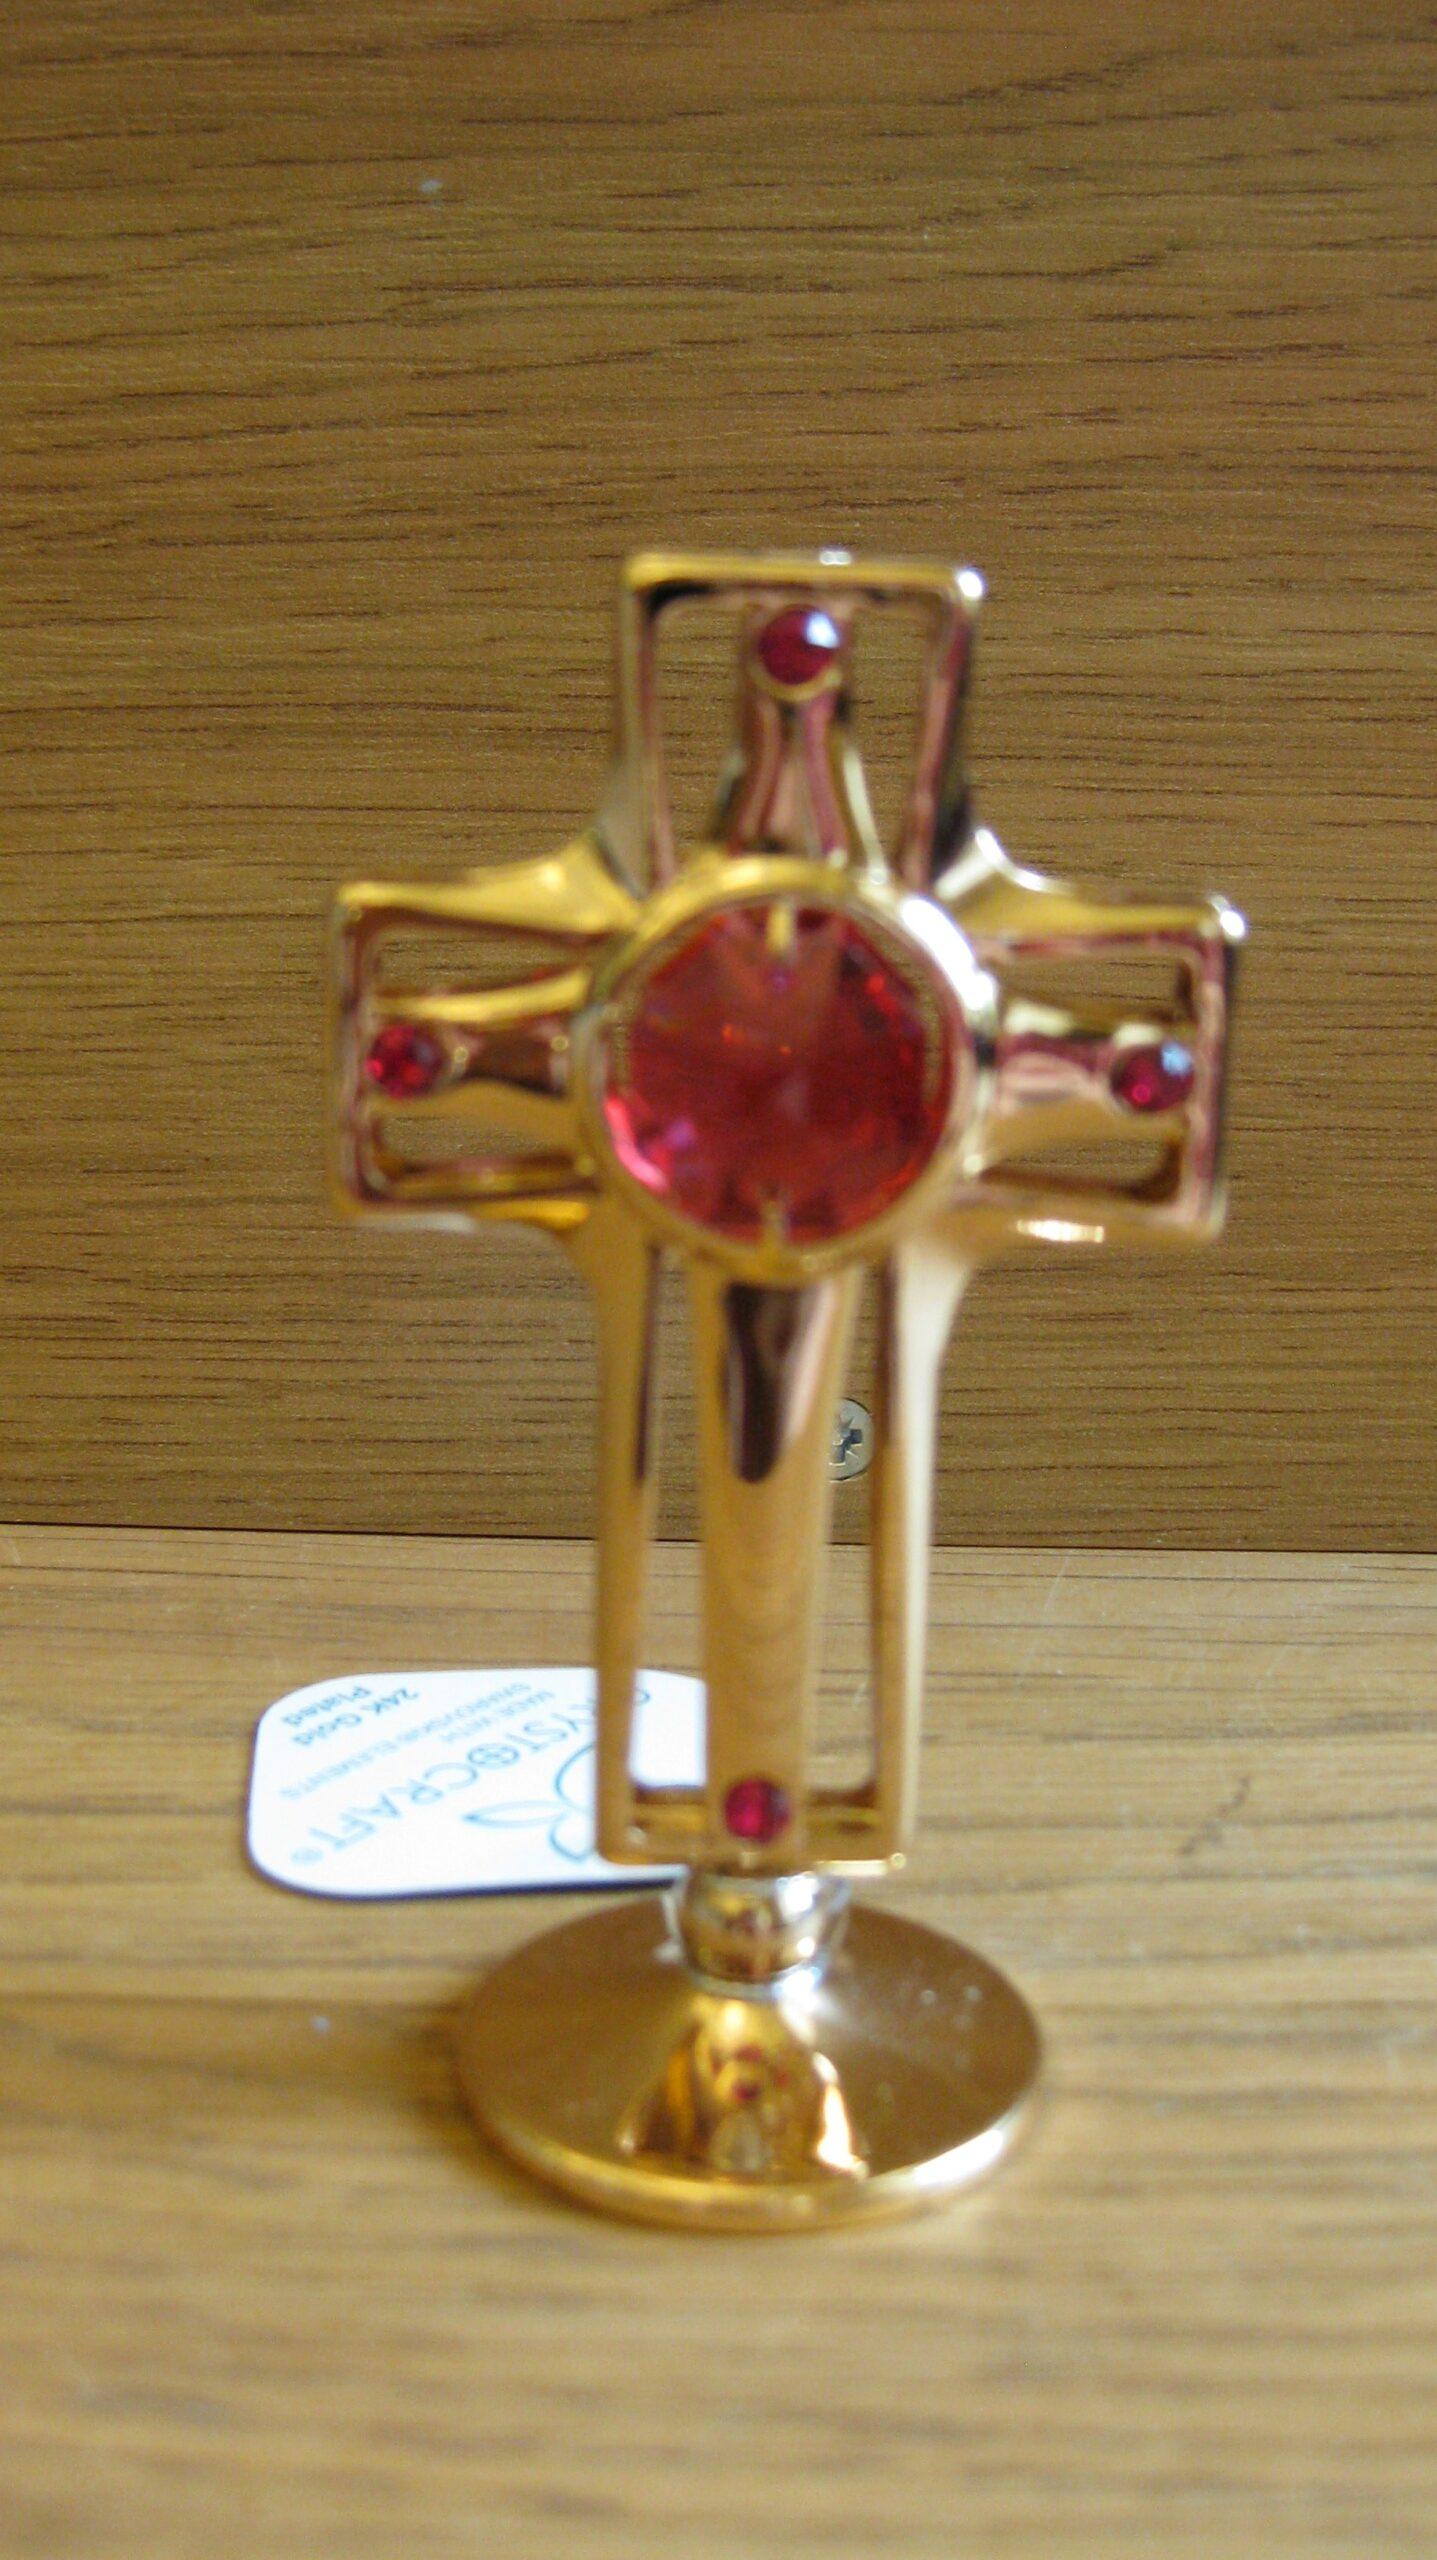 Kuldne rist swarovski kristalliga. Kõrgus 7.5cm